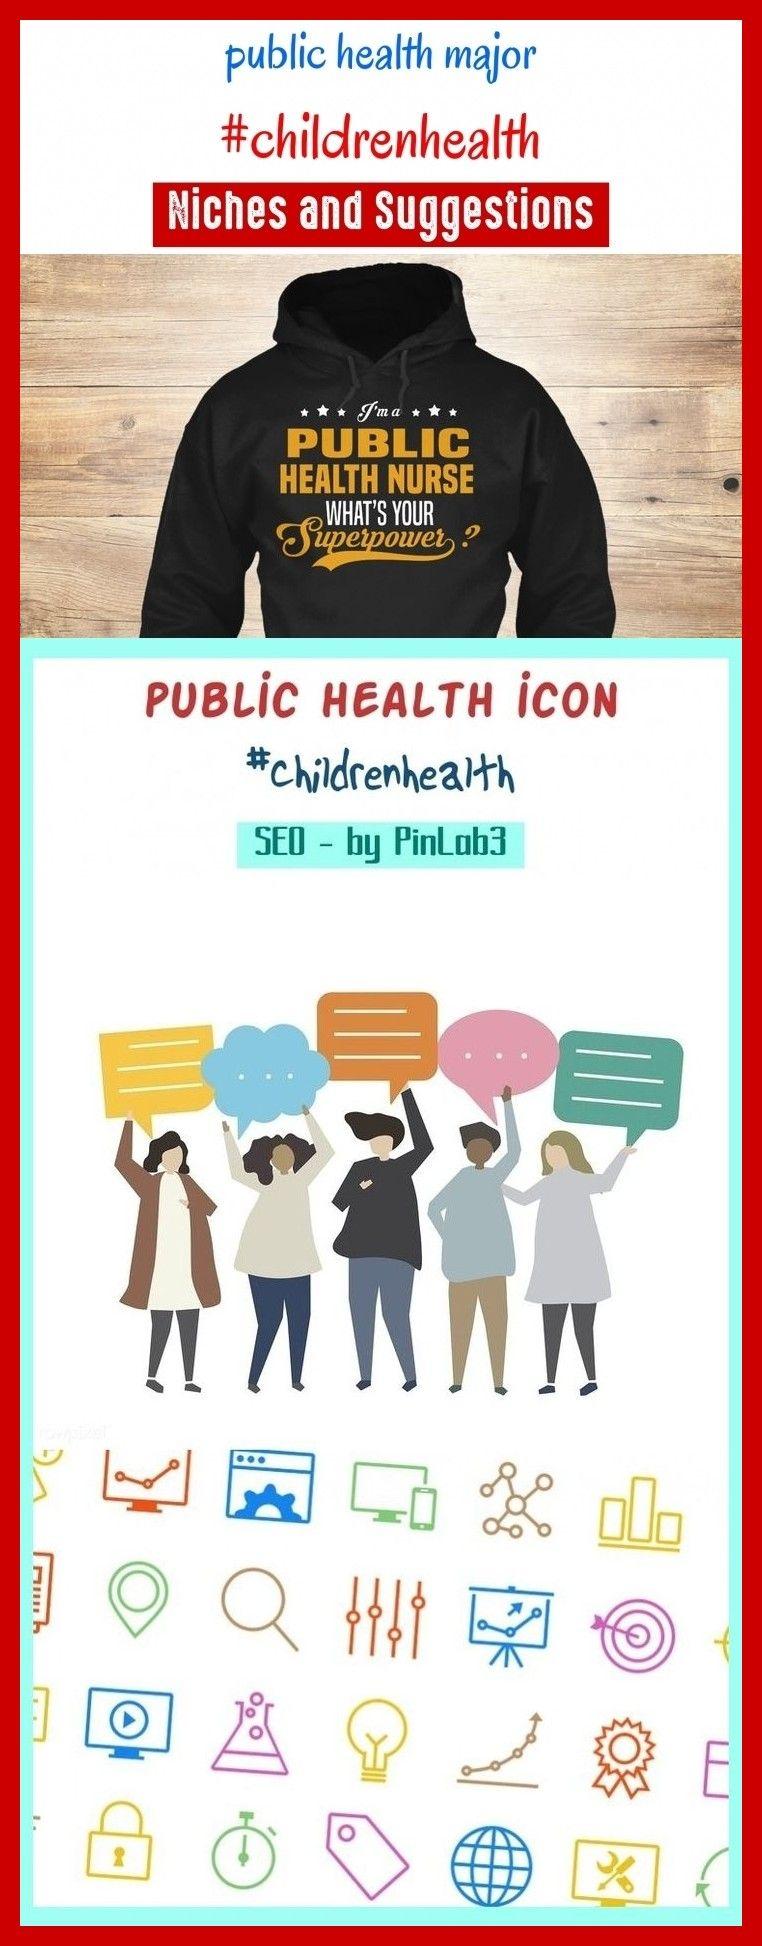 Public health major childrenhealth seo blog niches